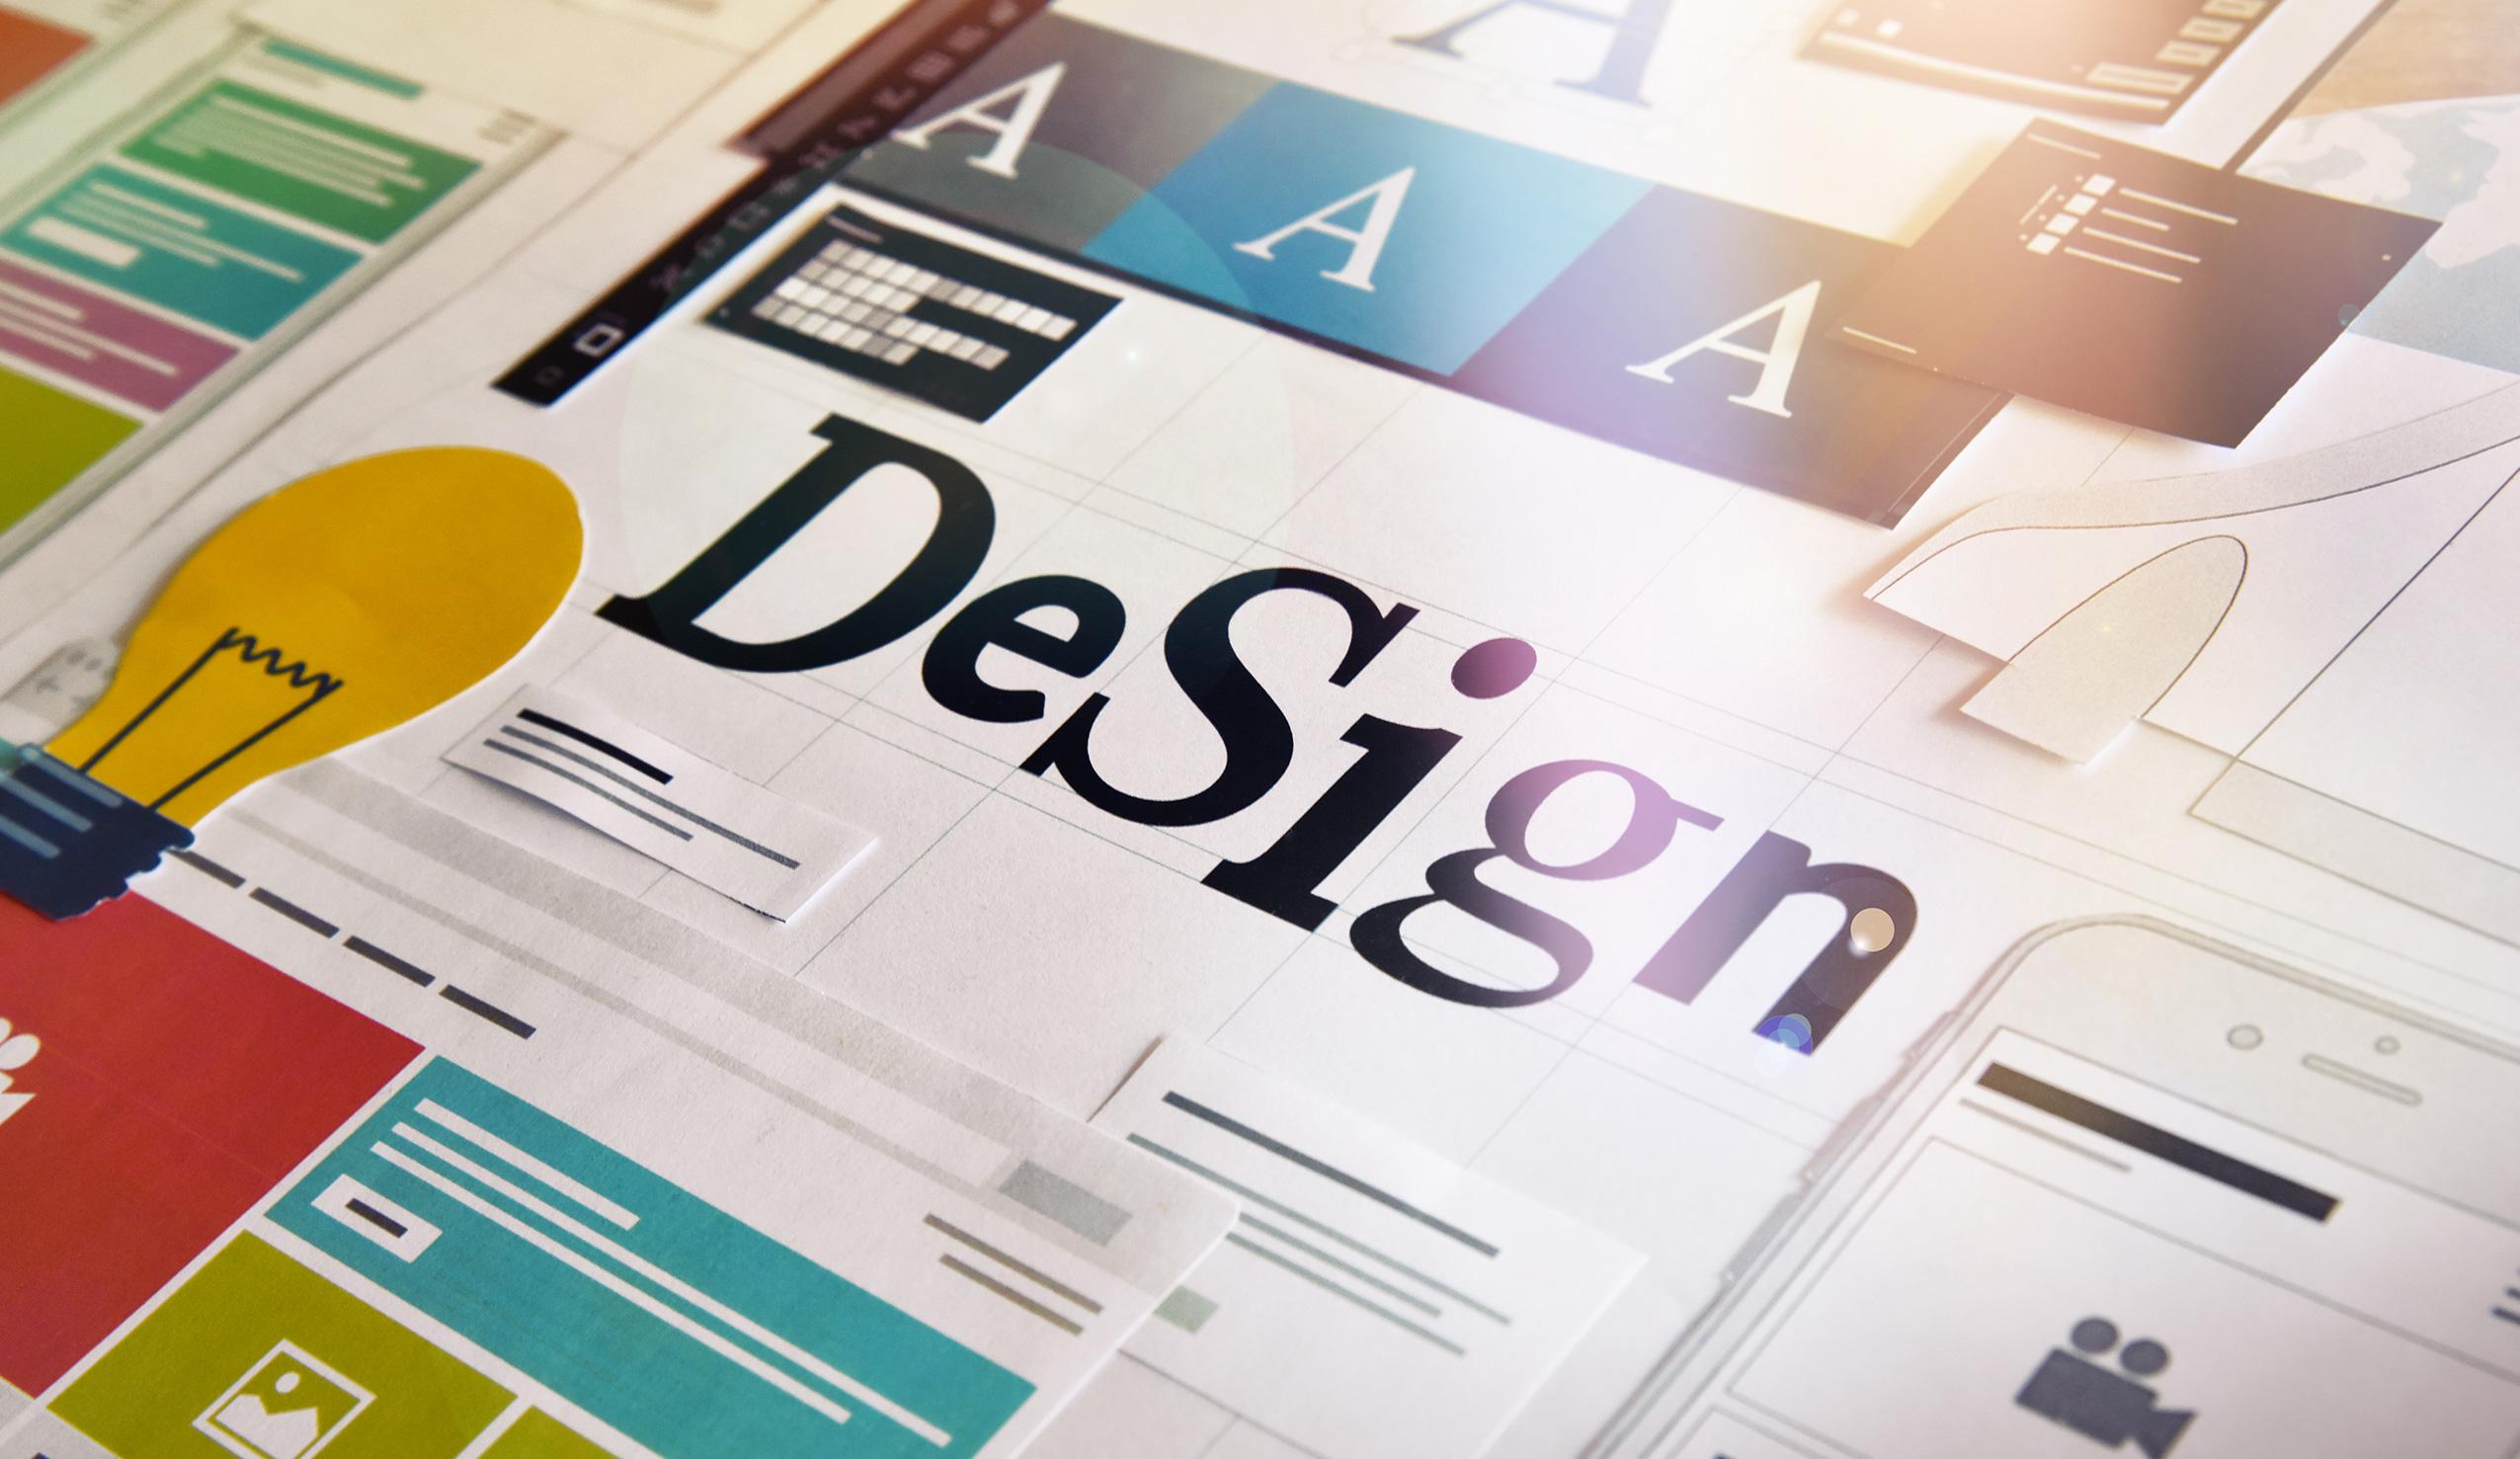 Logo aziendale, perché è fondamentale e come deve essere